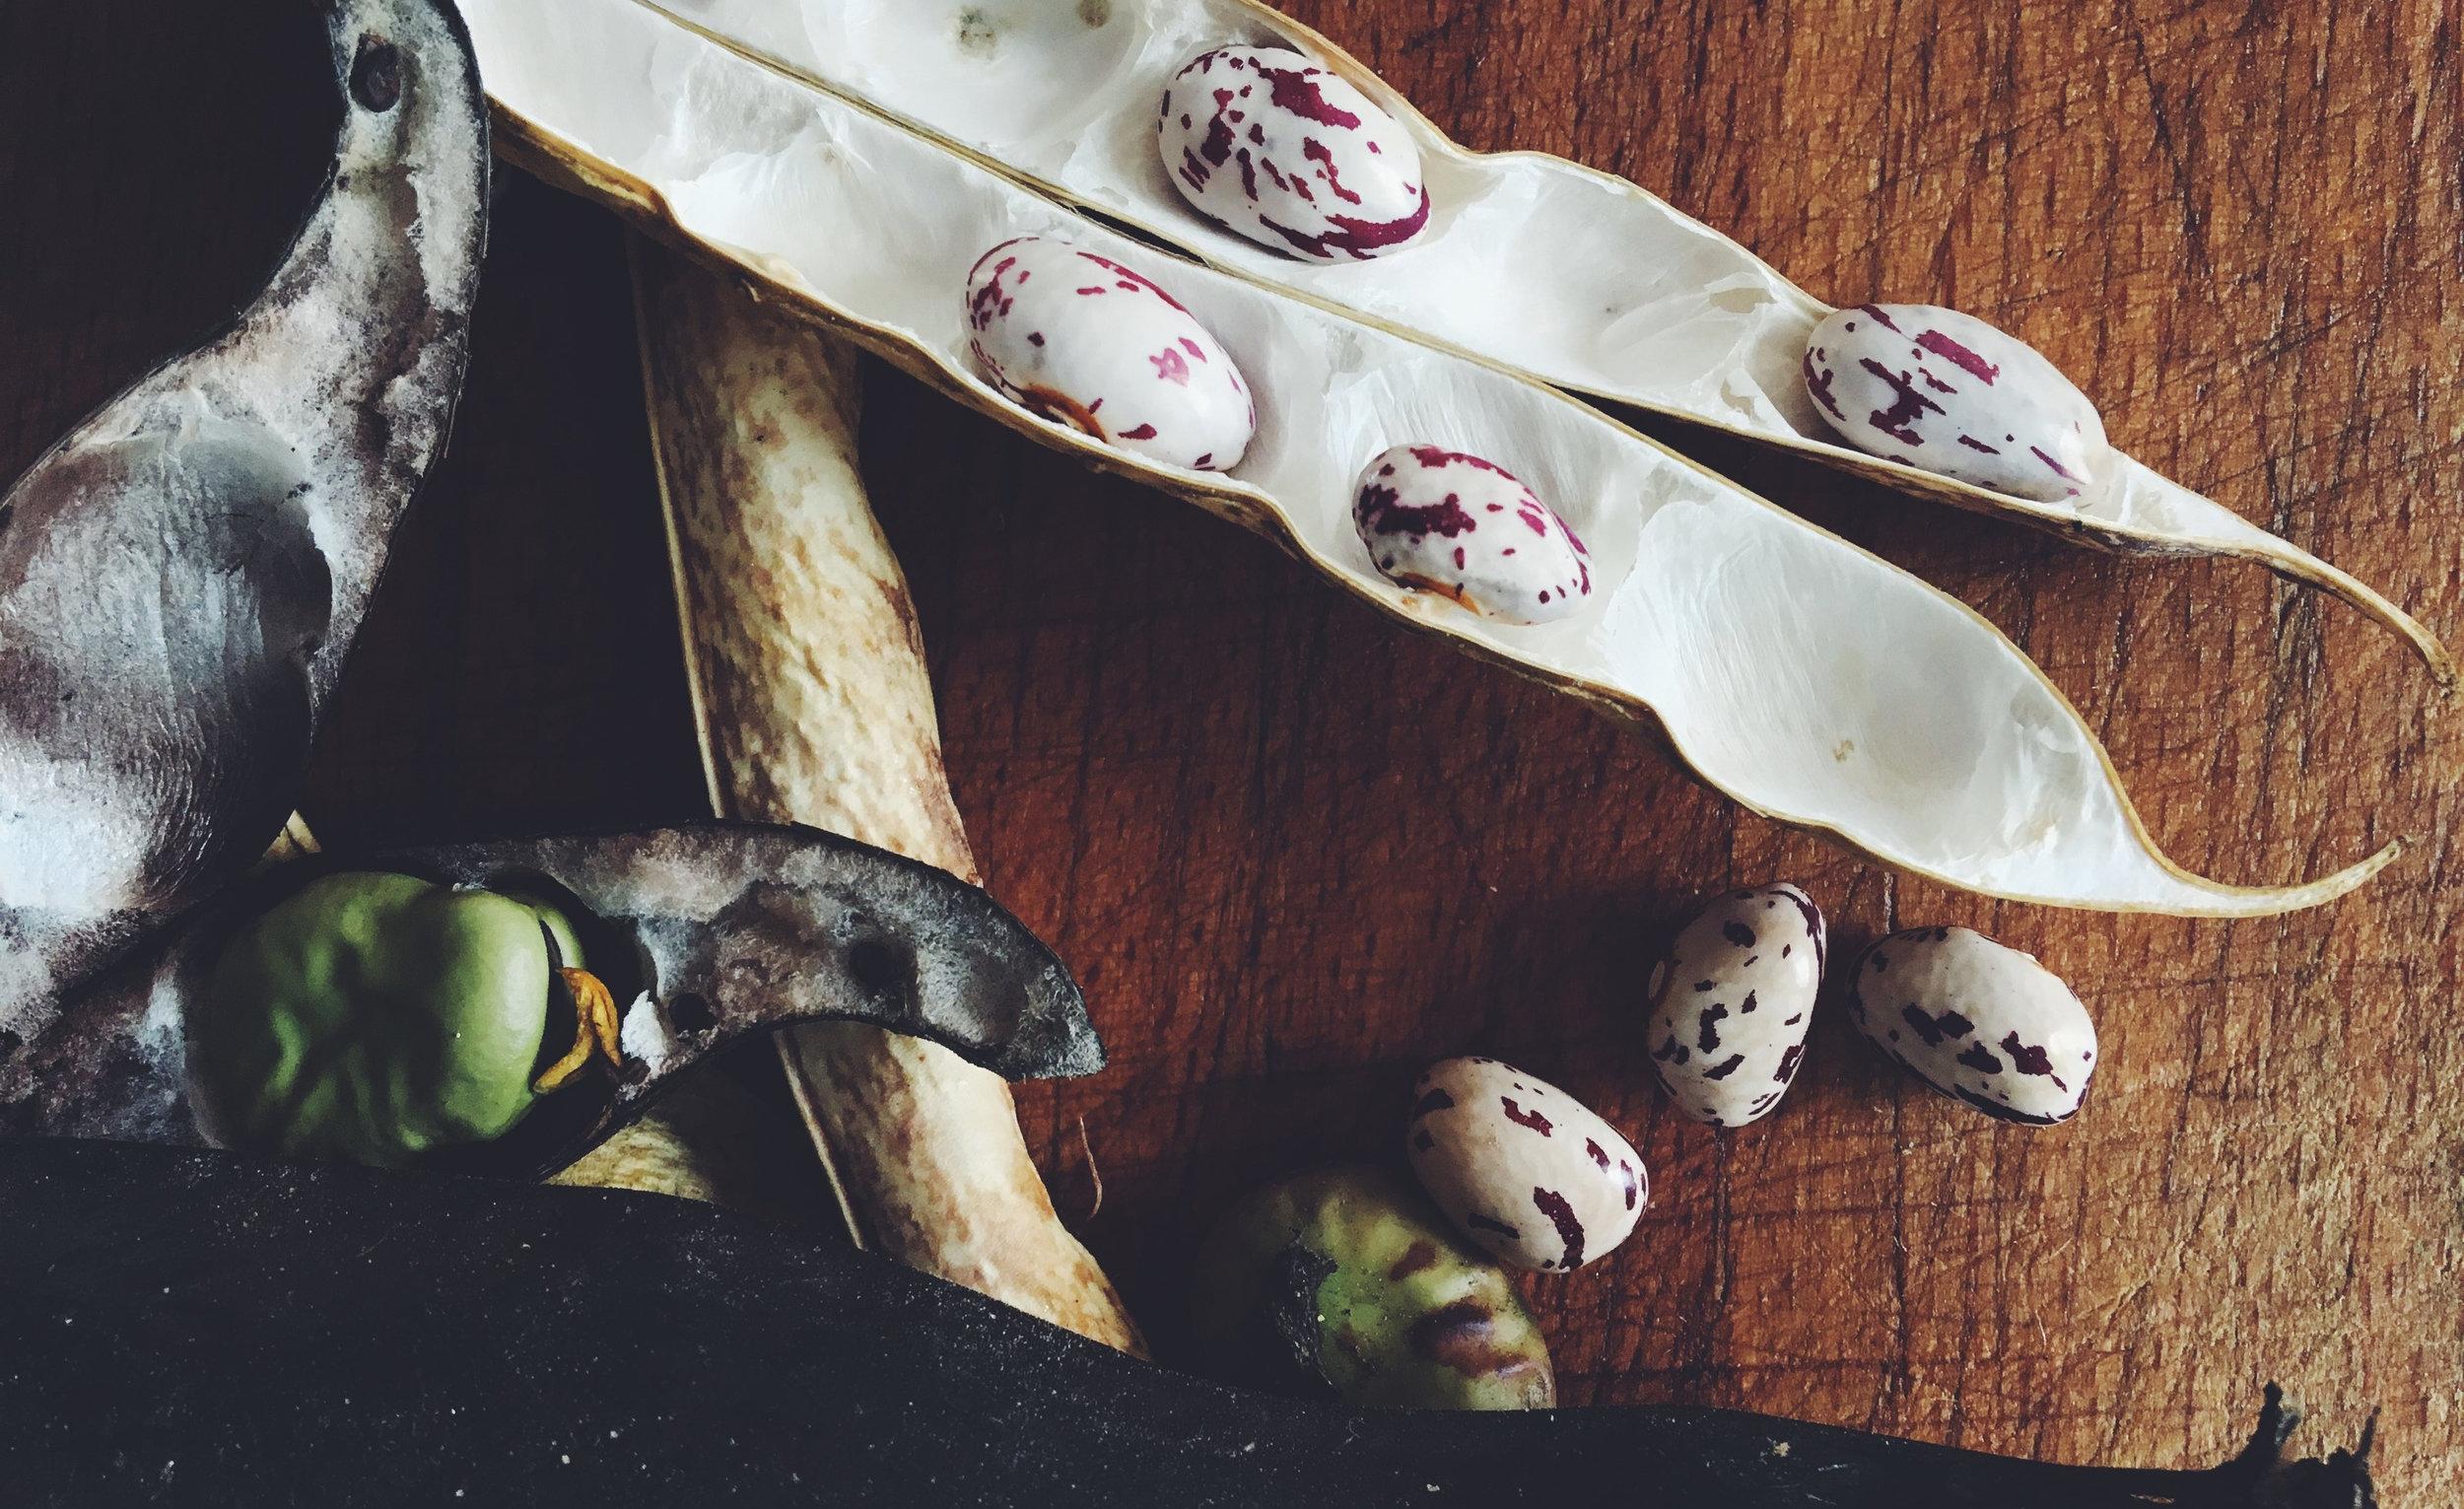 The art of seedsaving - With Signe Voltelen - Cph Seeds